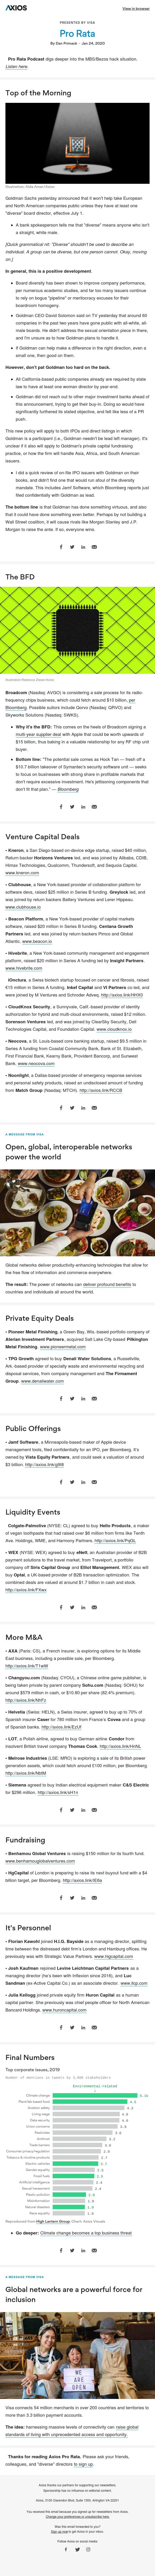 "Axios Pro Rata: Goldman's IPO ""diversity"" pledge — Broadcom's next sale — Cimate tops corporate issues"